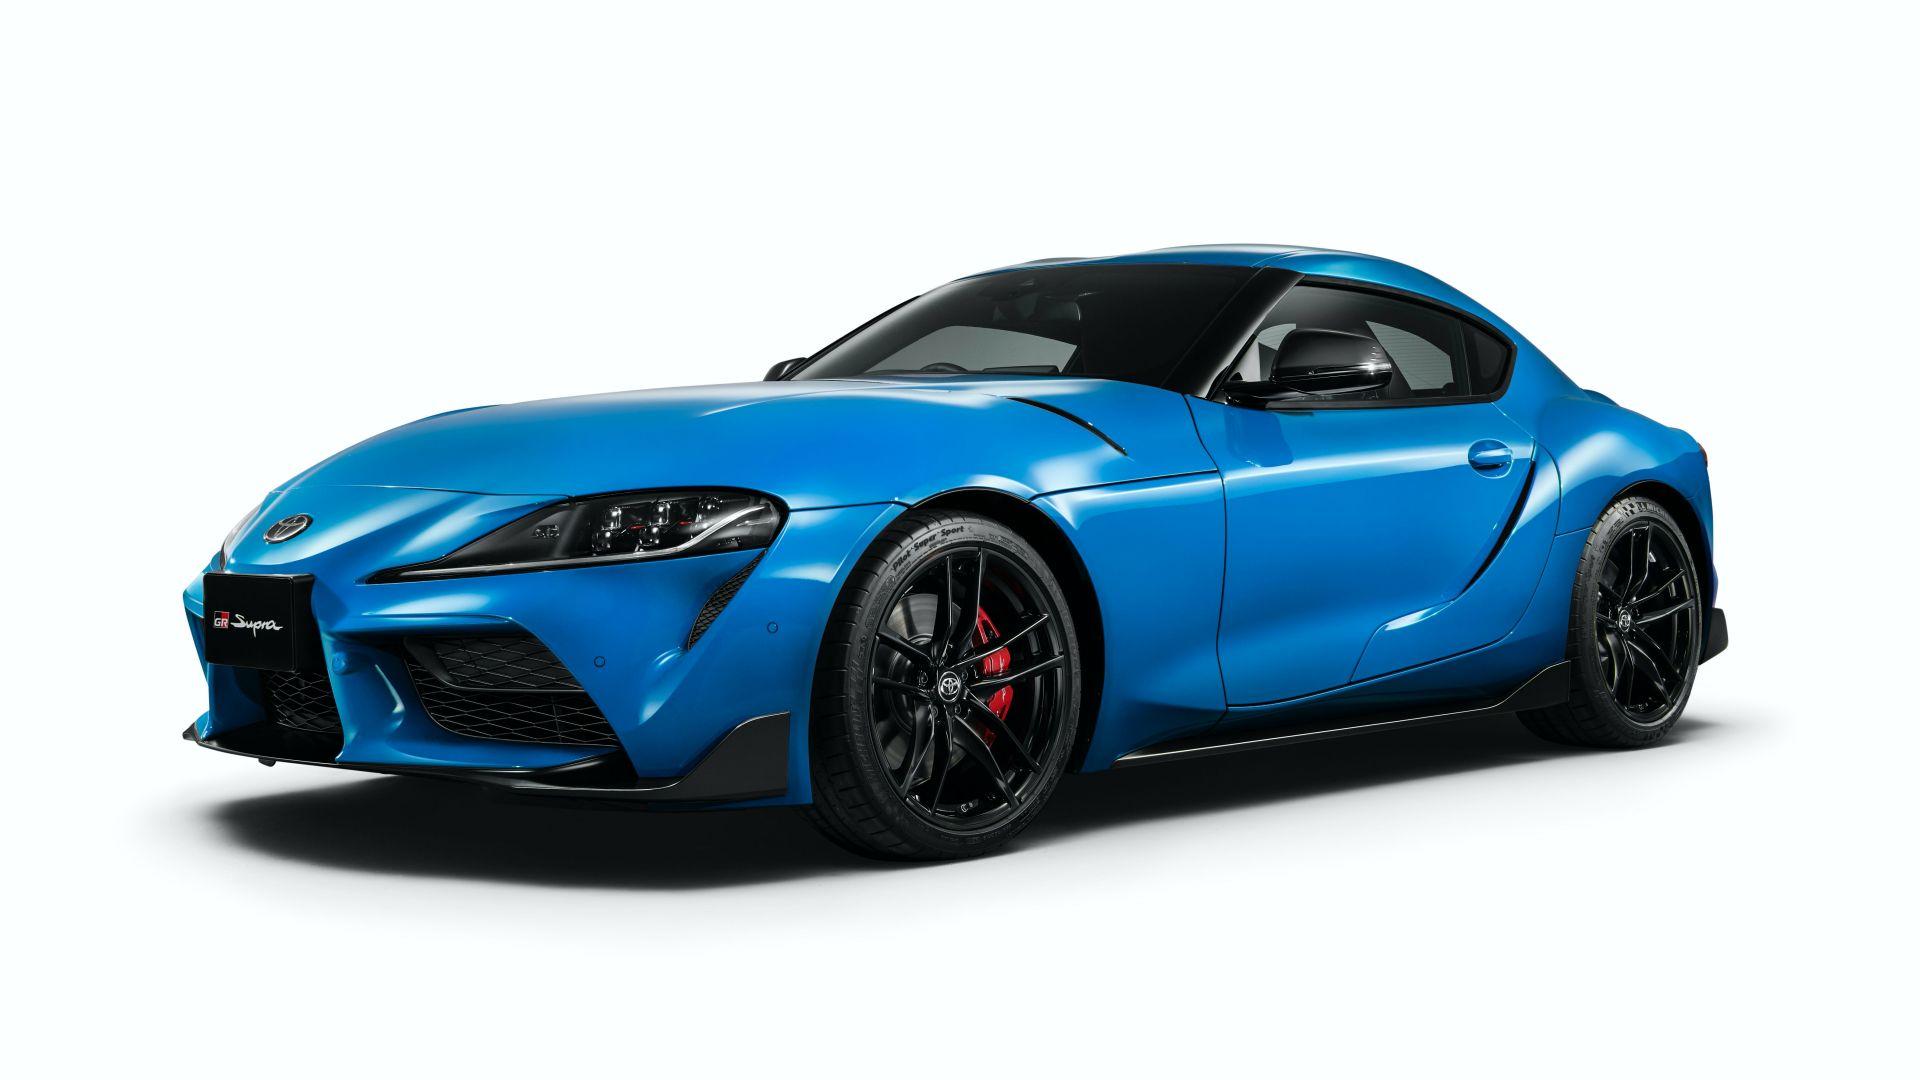 Toyota-GR-Supra-RZ-Horizon-Blue-Edition-2